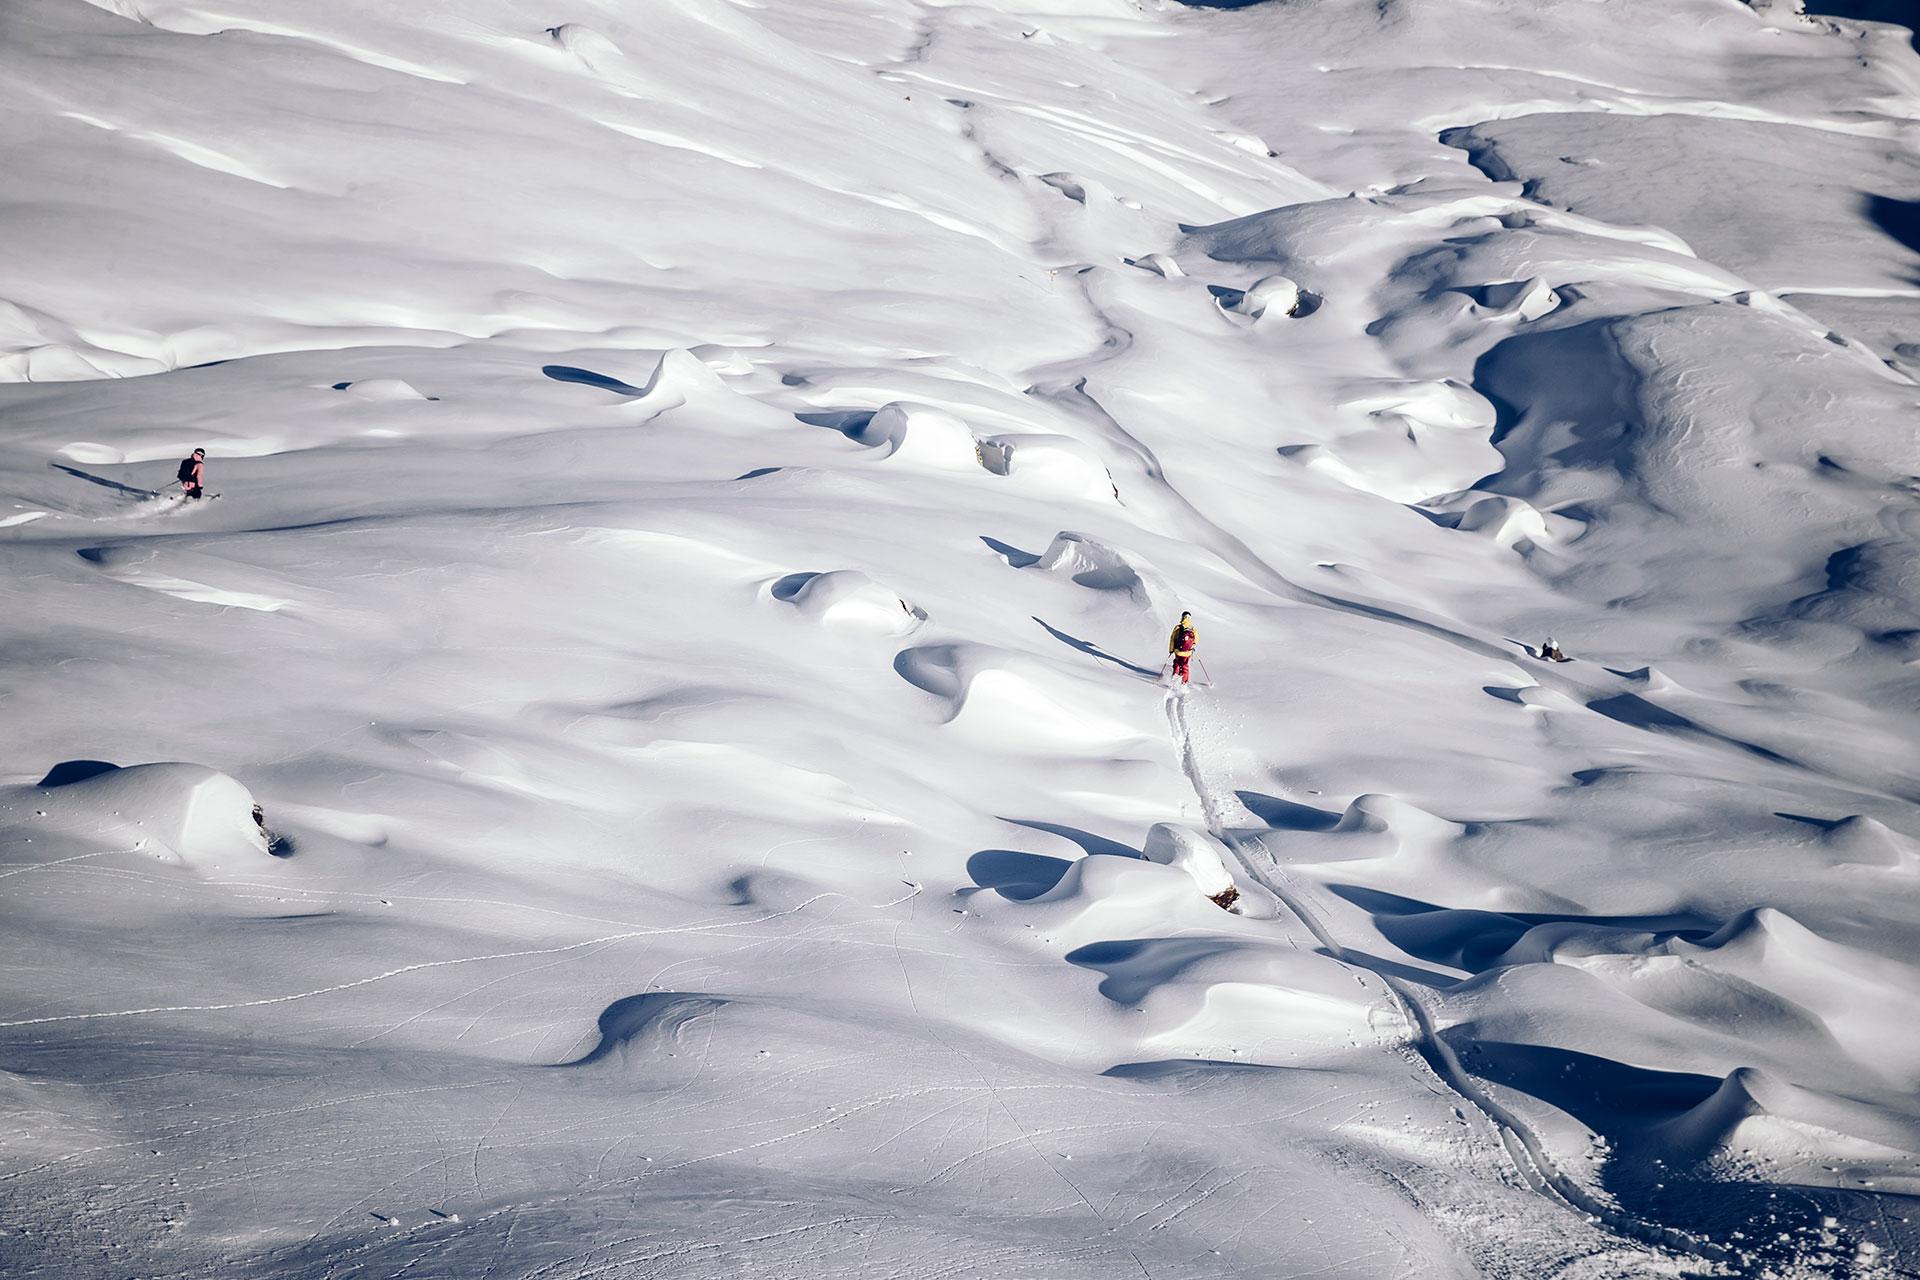 Sport Fotograf Ski Snowboard Tiefschnee Freeride Powder Michael Müller Aktion Alpen London